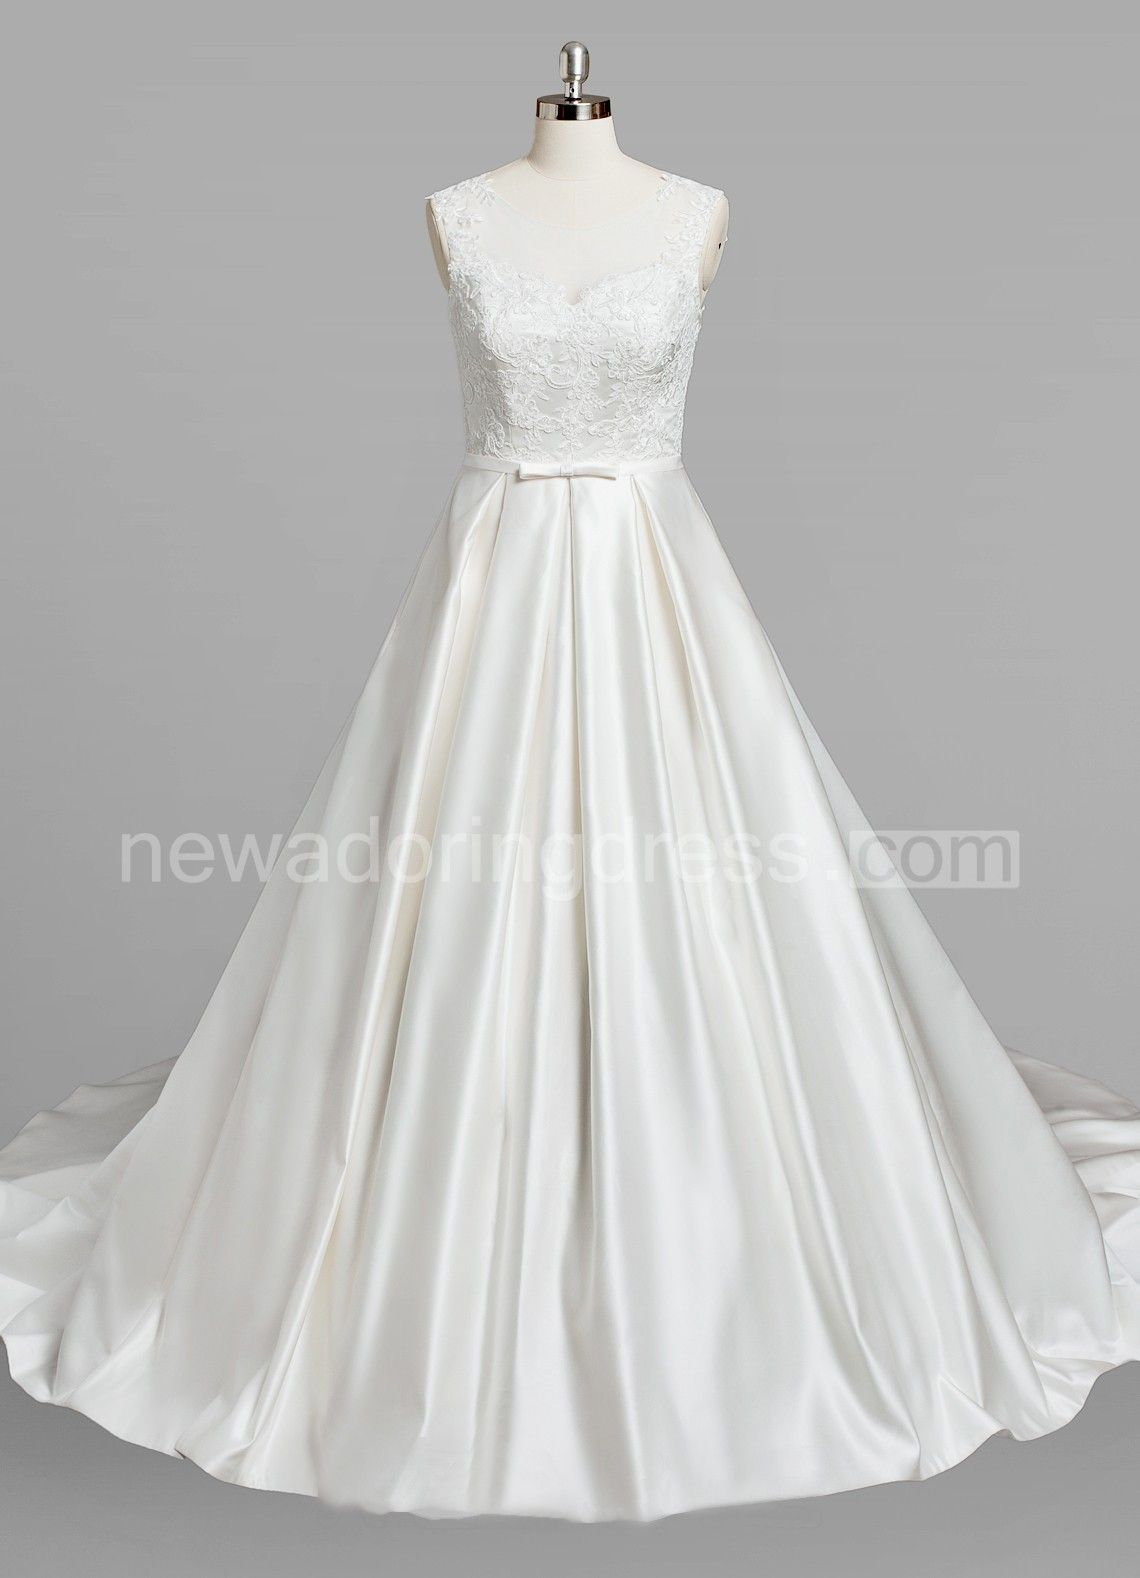 All wedding dresses satin wedding dresses buy wedding dress